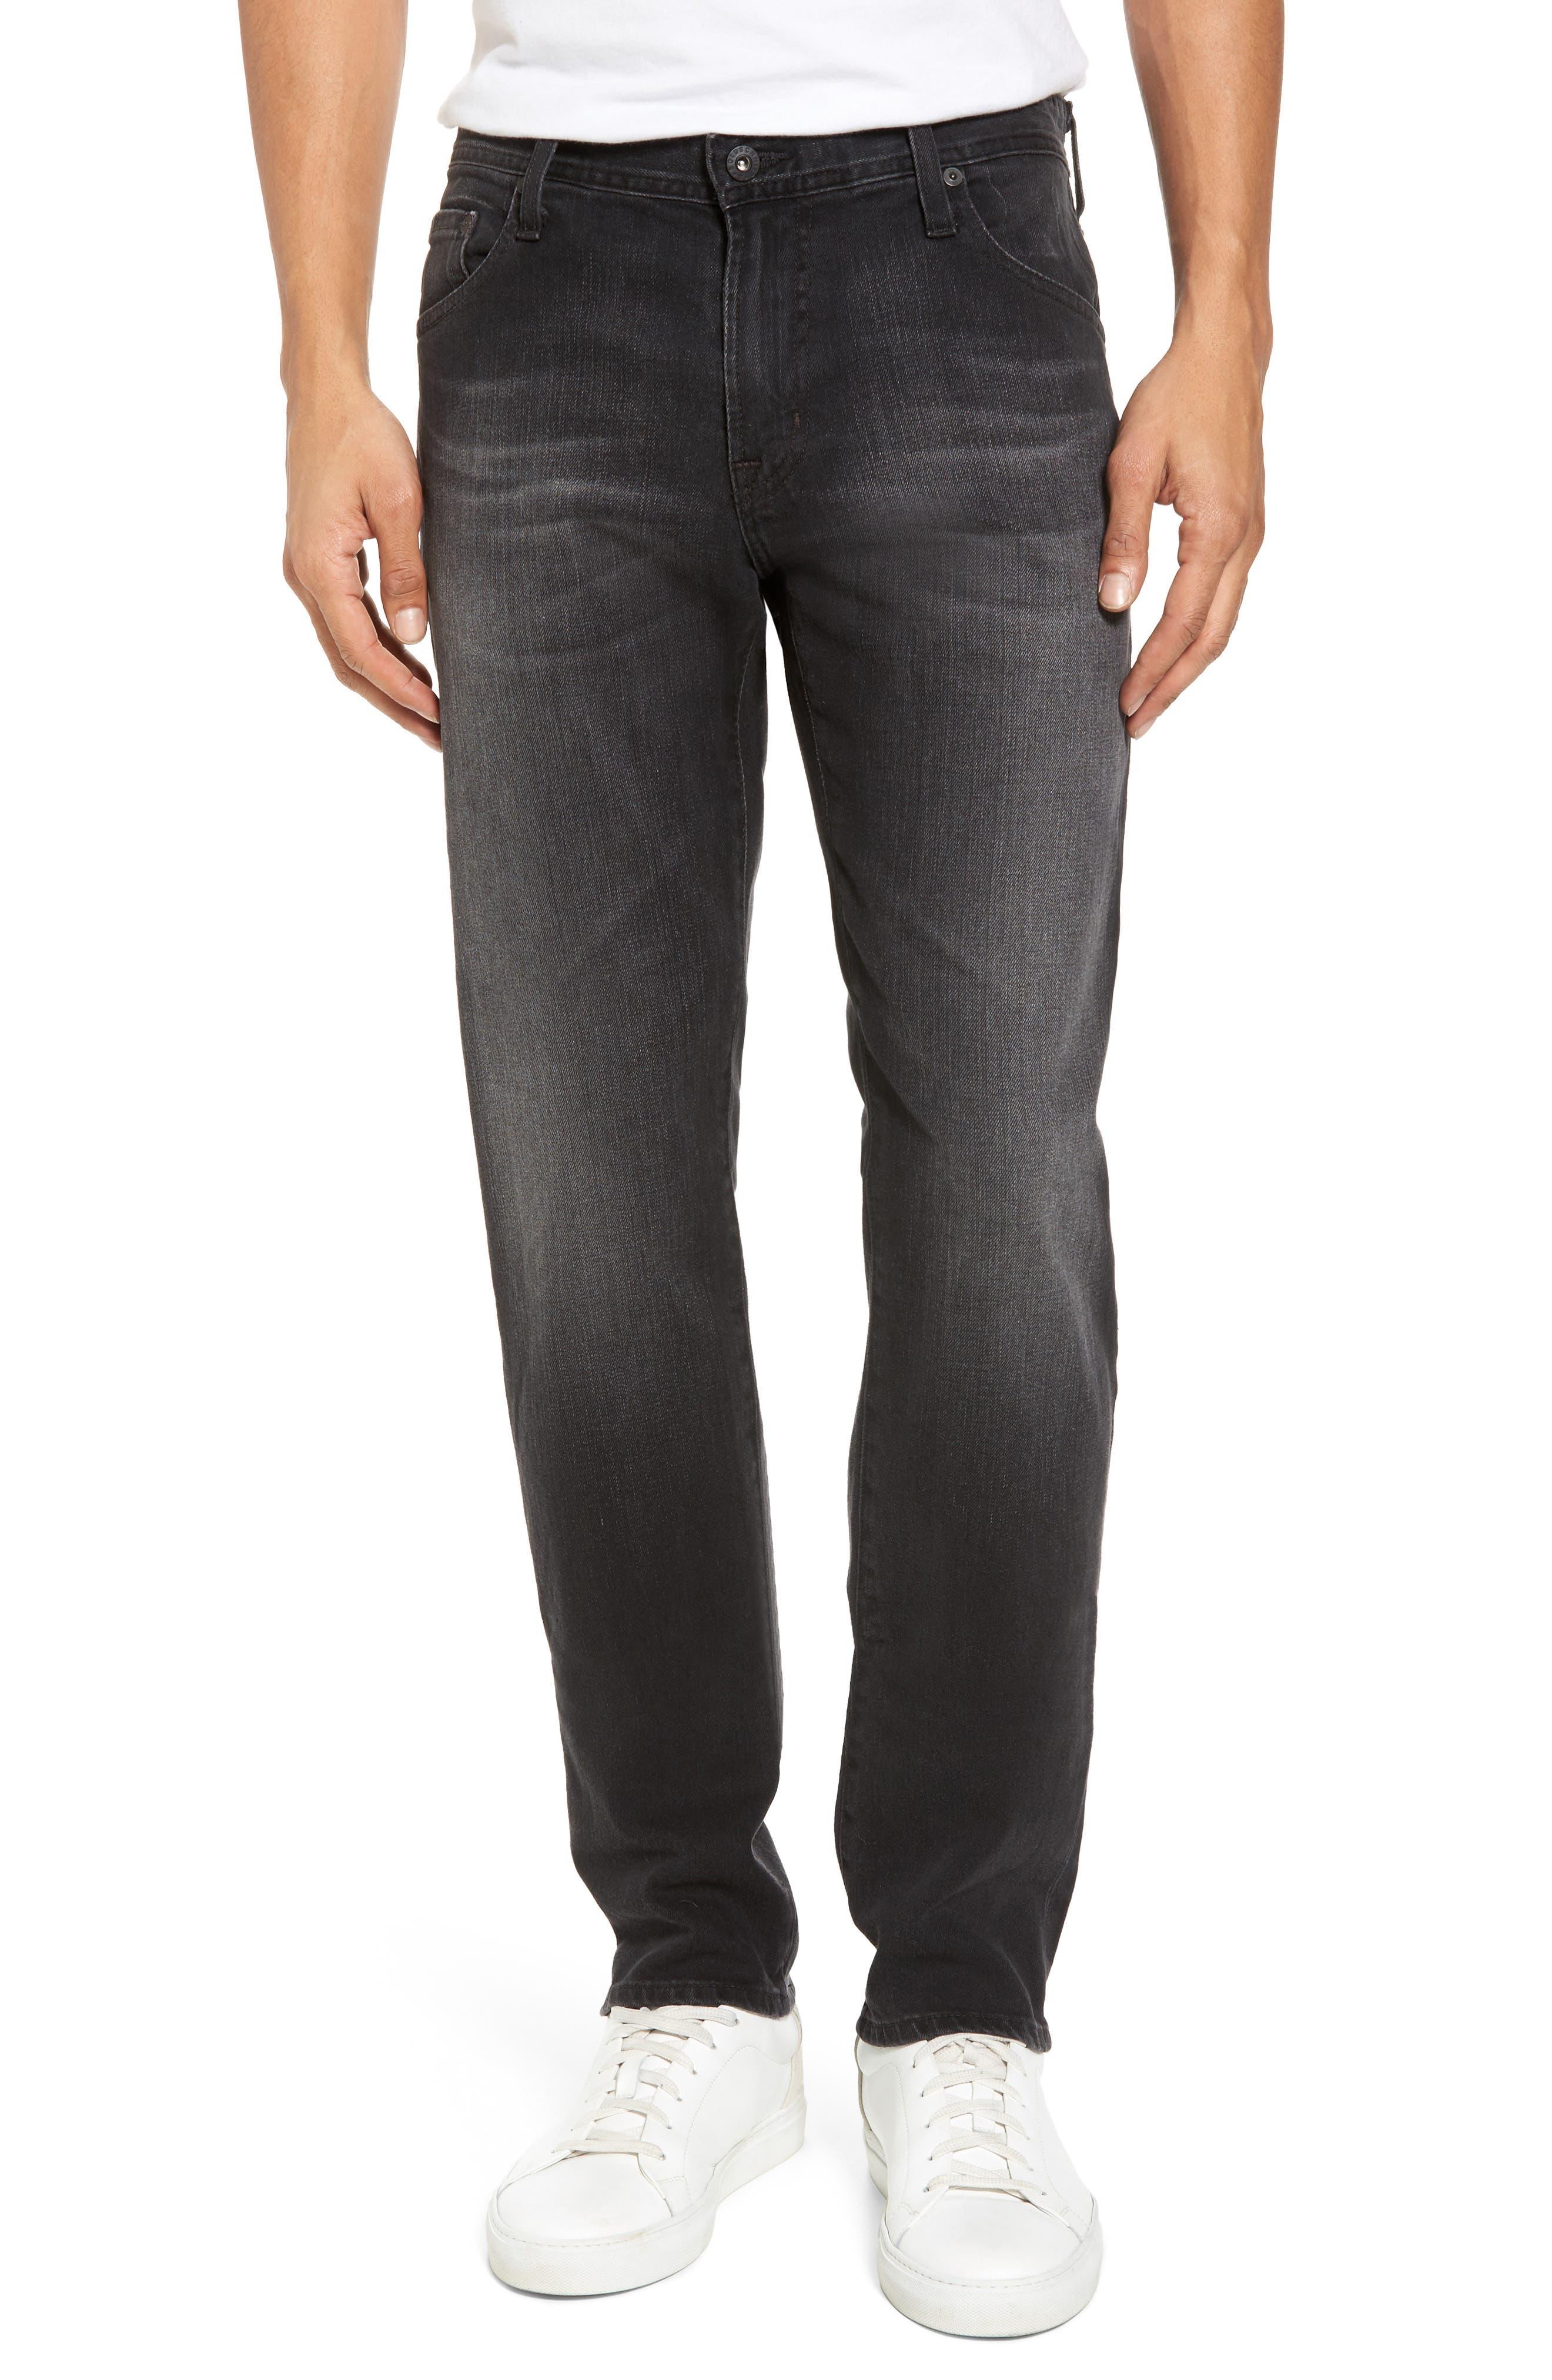 Tellis Modern Slim Fit Jeans,                         Main,                         color, 019